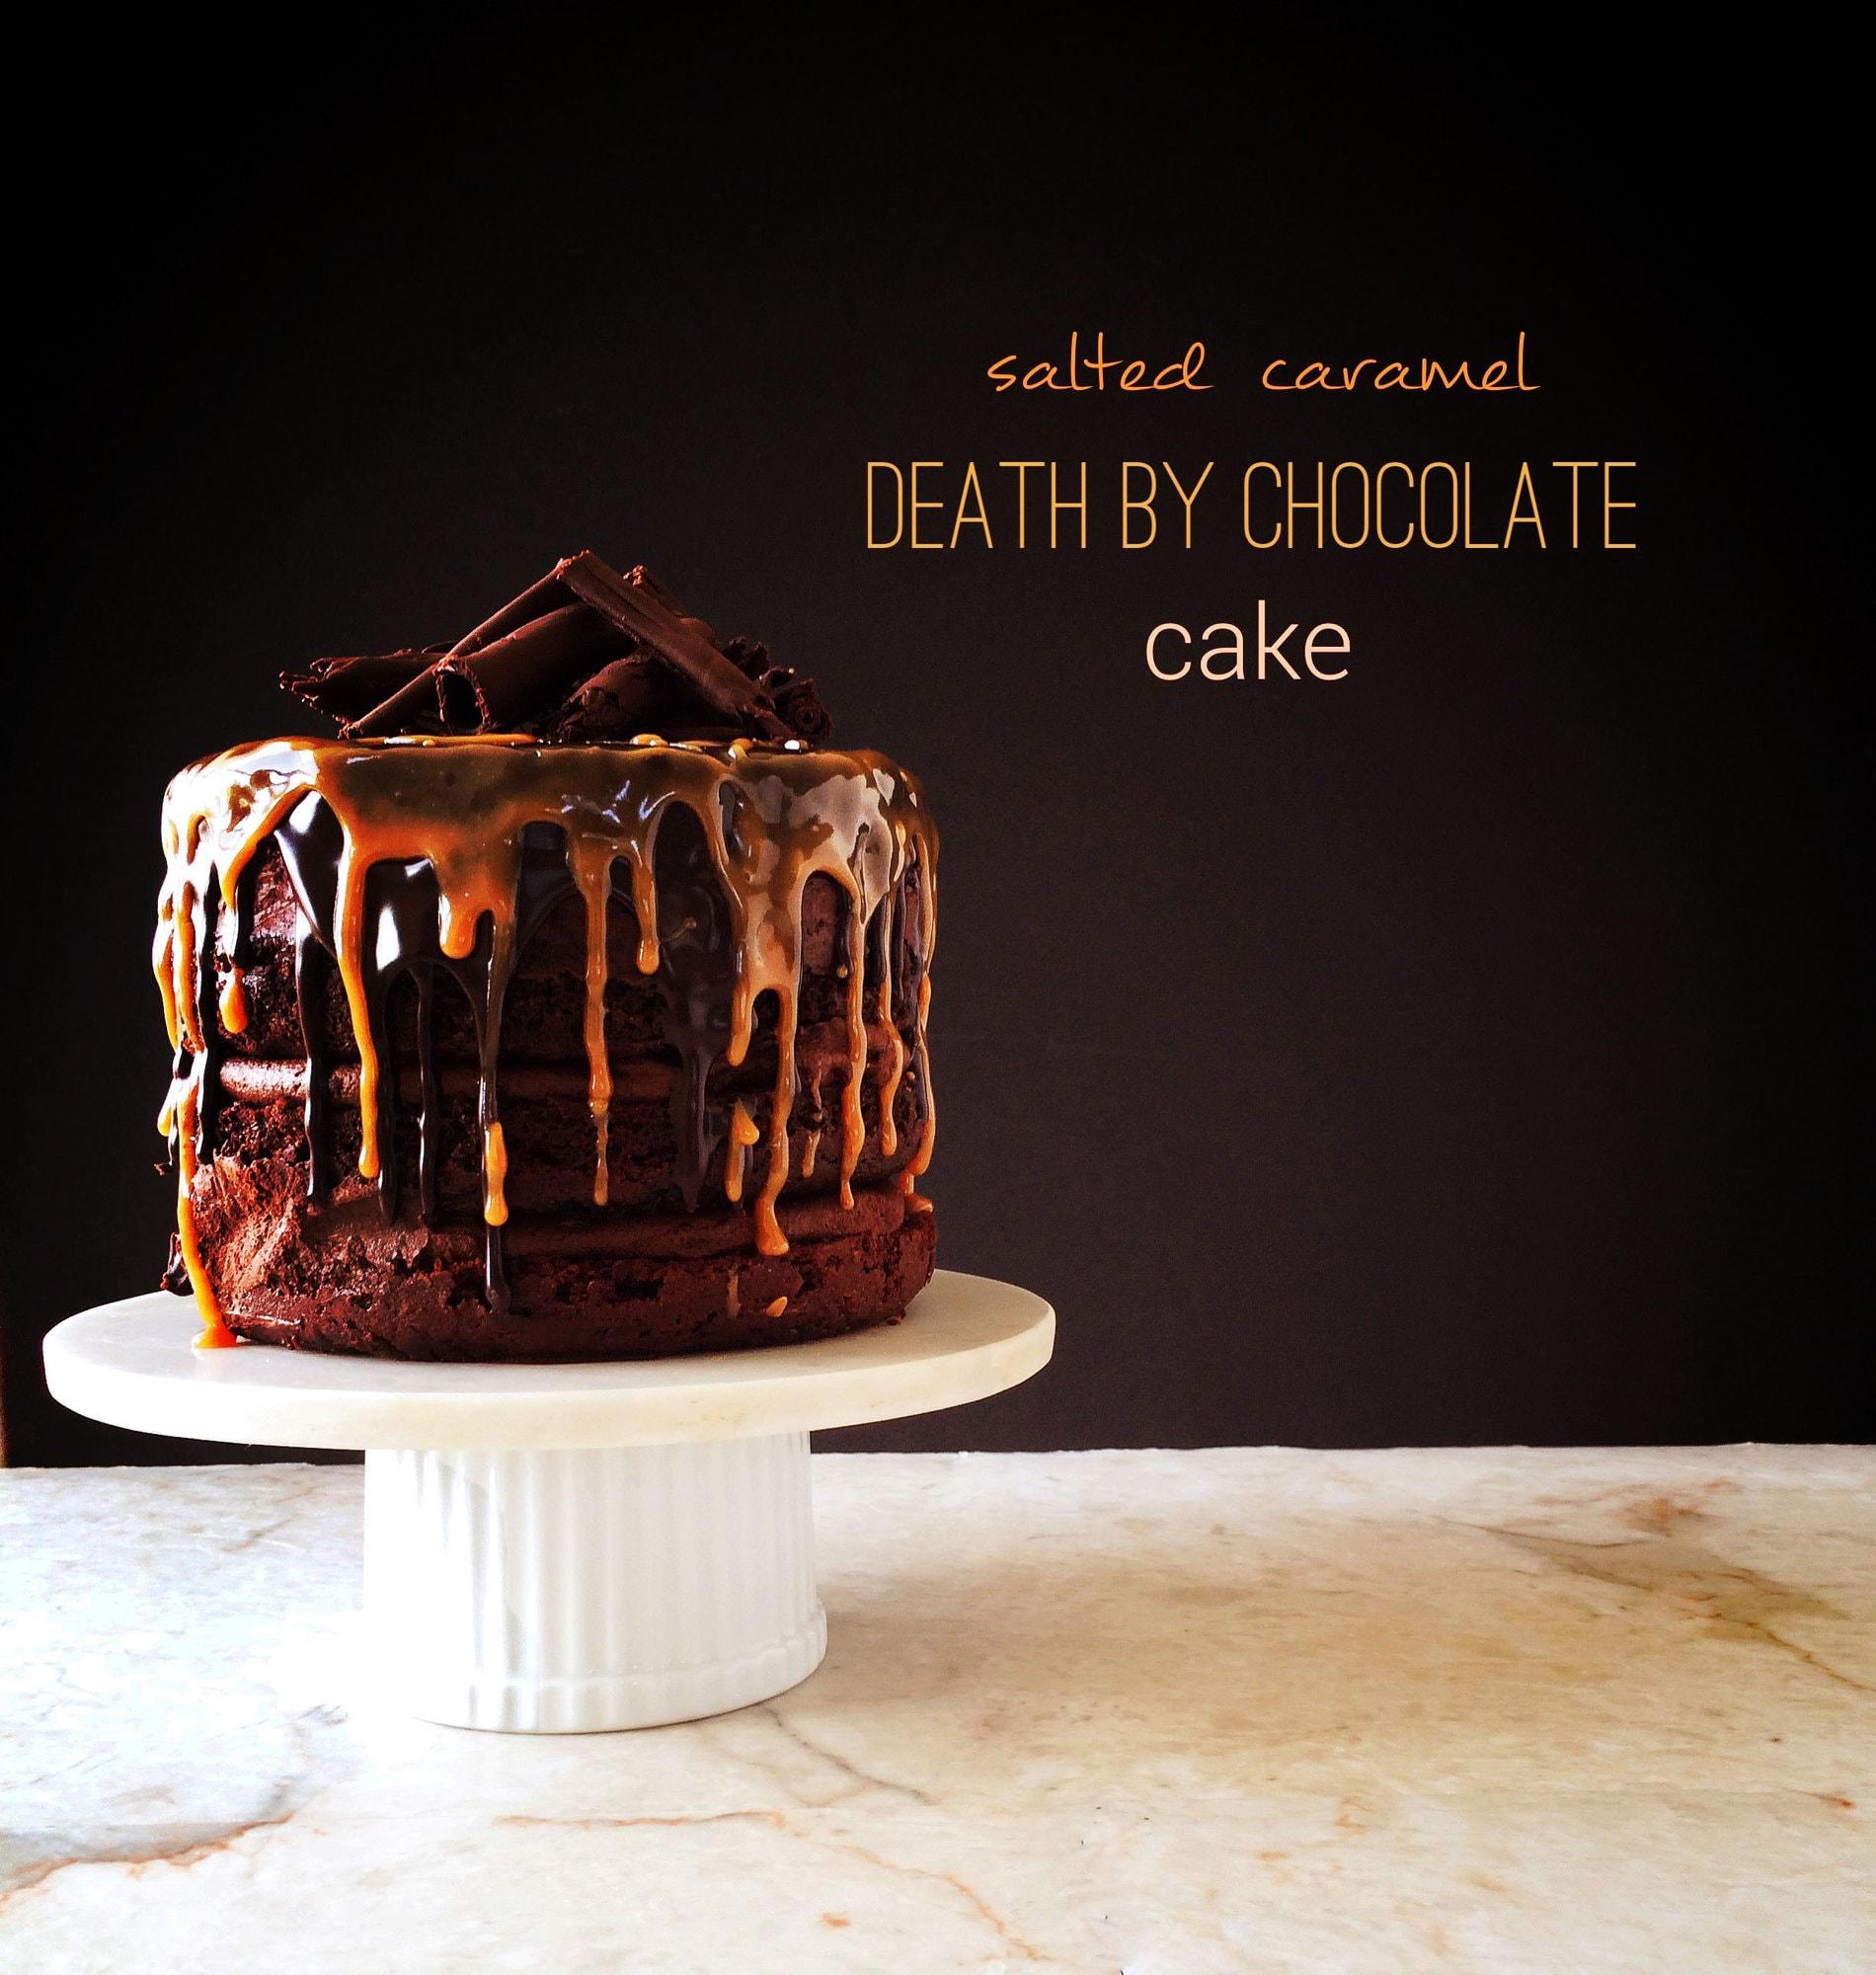 Dark chocolate cake with caramel filling